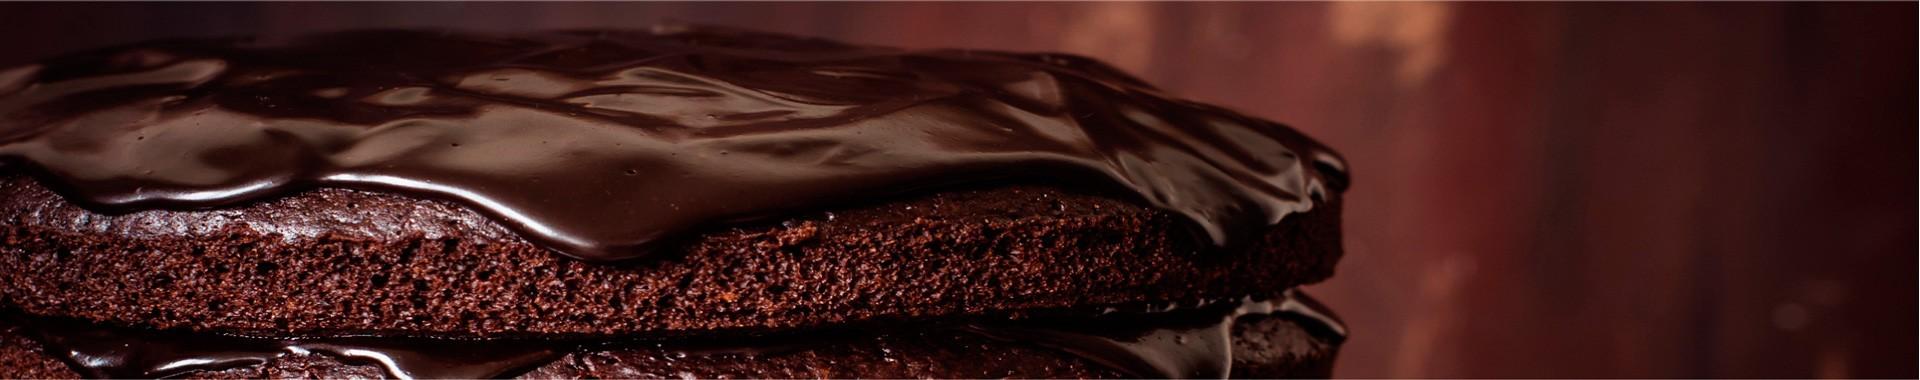 Serrín dulce y cinco chocolates